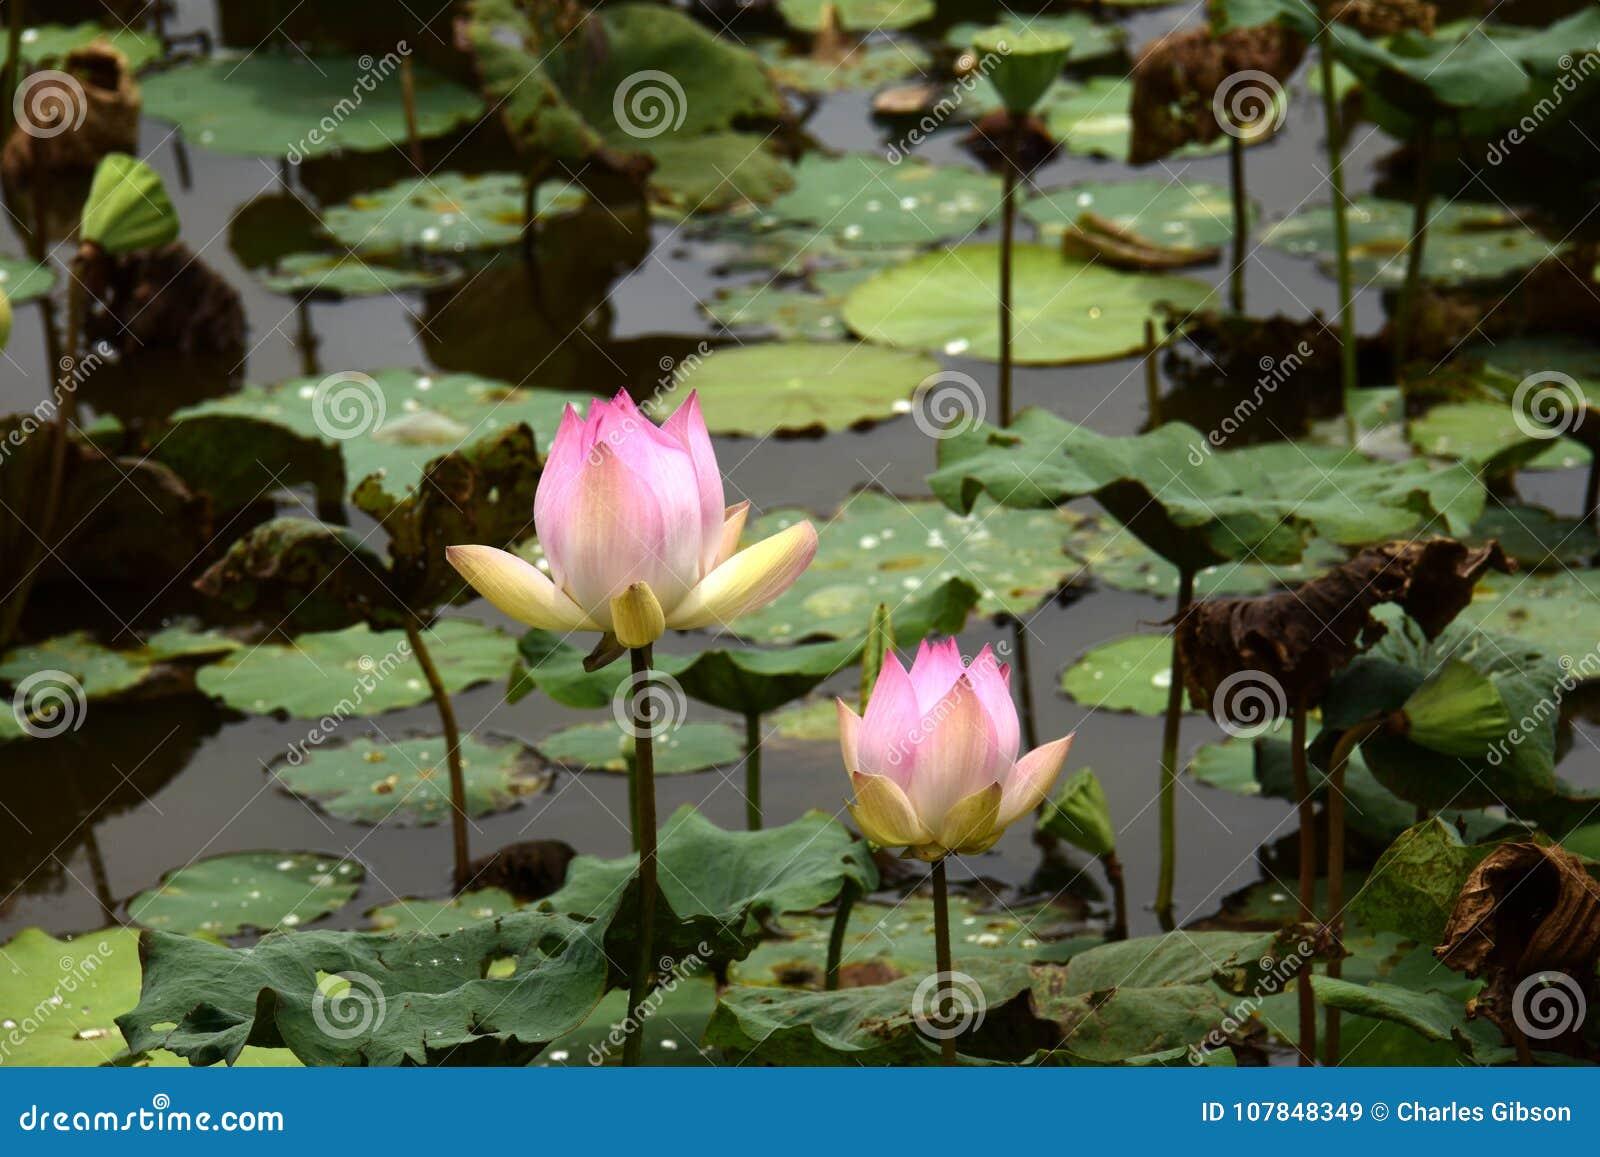 Lotus Plants And Flowers Nelumbo Nucifera Stock Image Image Of